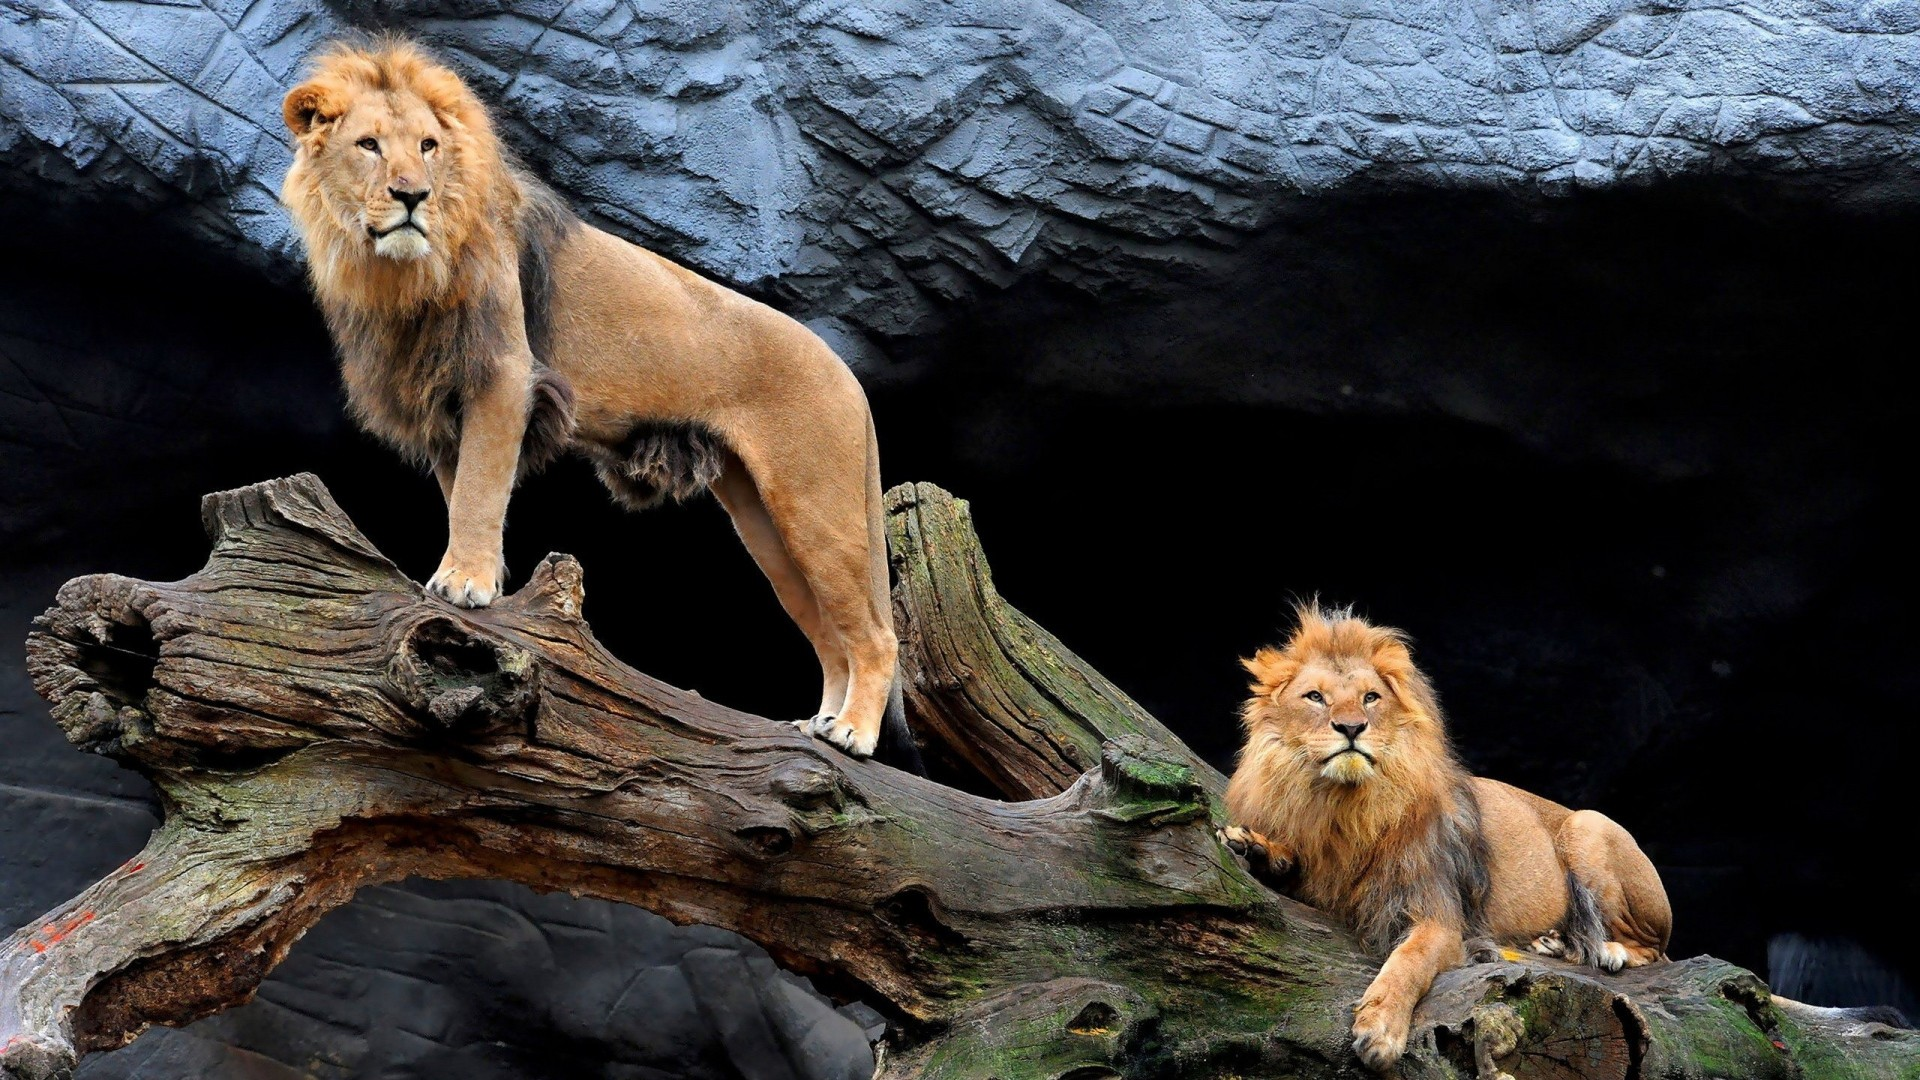 Wallpaper lions, steam, wood, sit